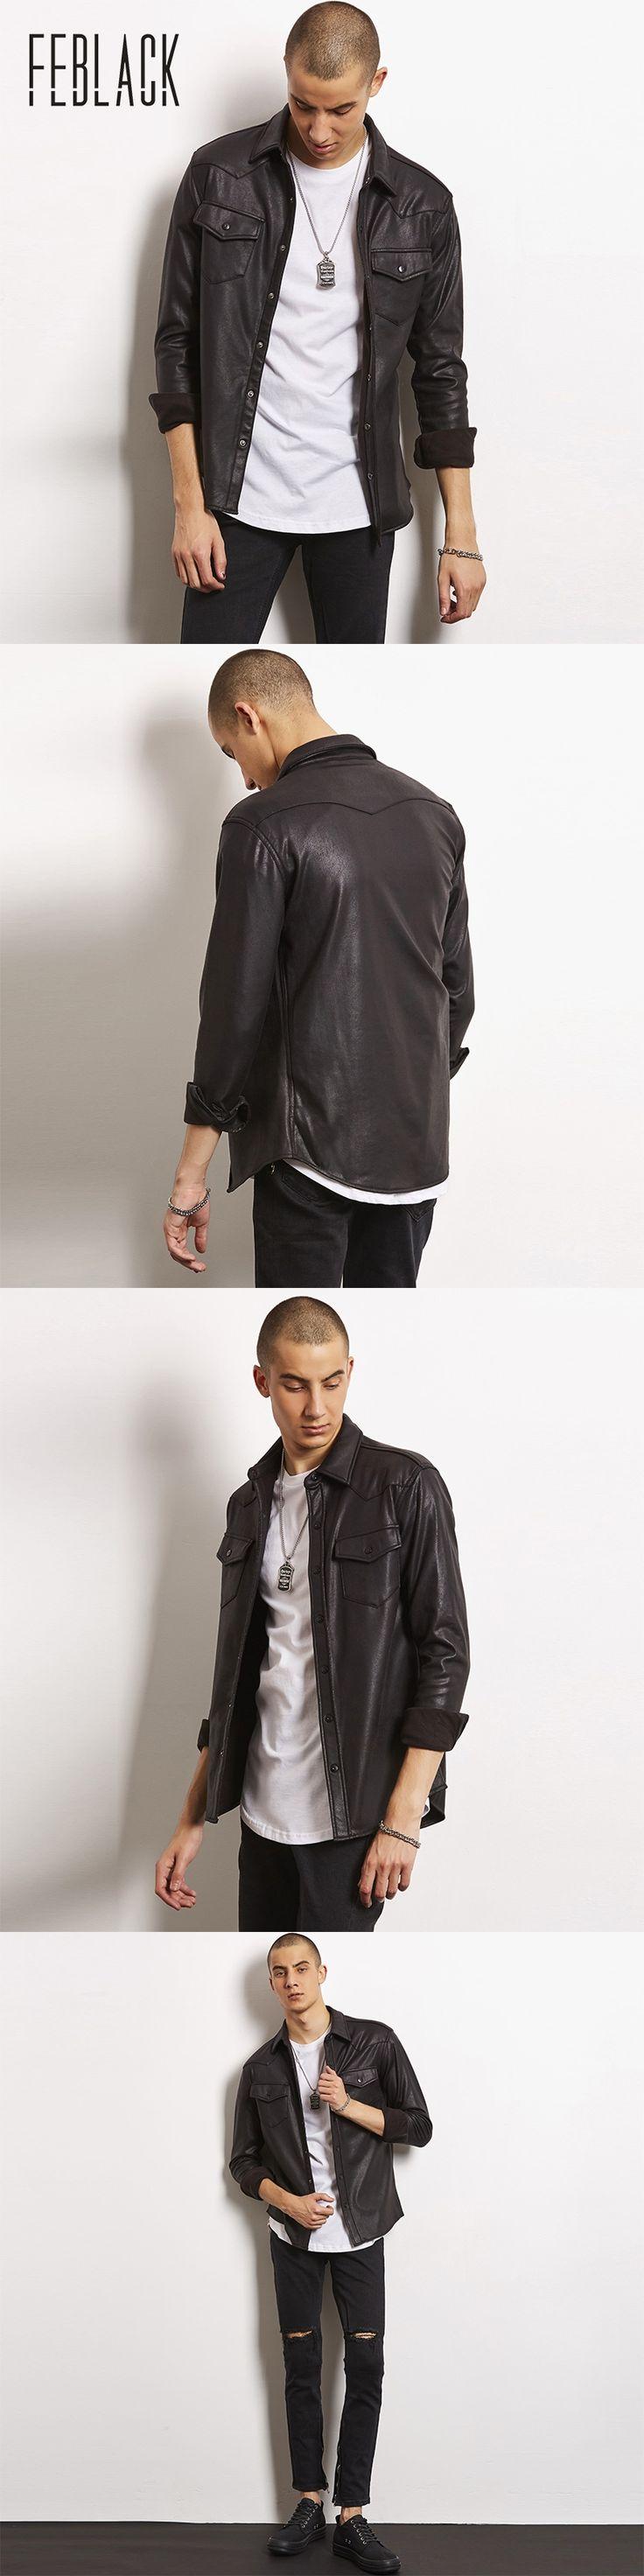 FEBLACK Faux Leather Jacket Men Turn-down Collar Jaqueta De Couro Masculina PU Mens Leather Jackets Skull Punk Veste Cuir Homme